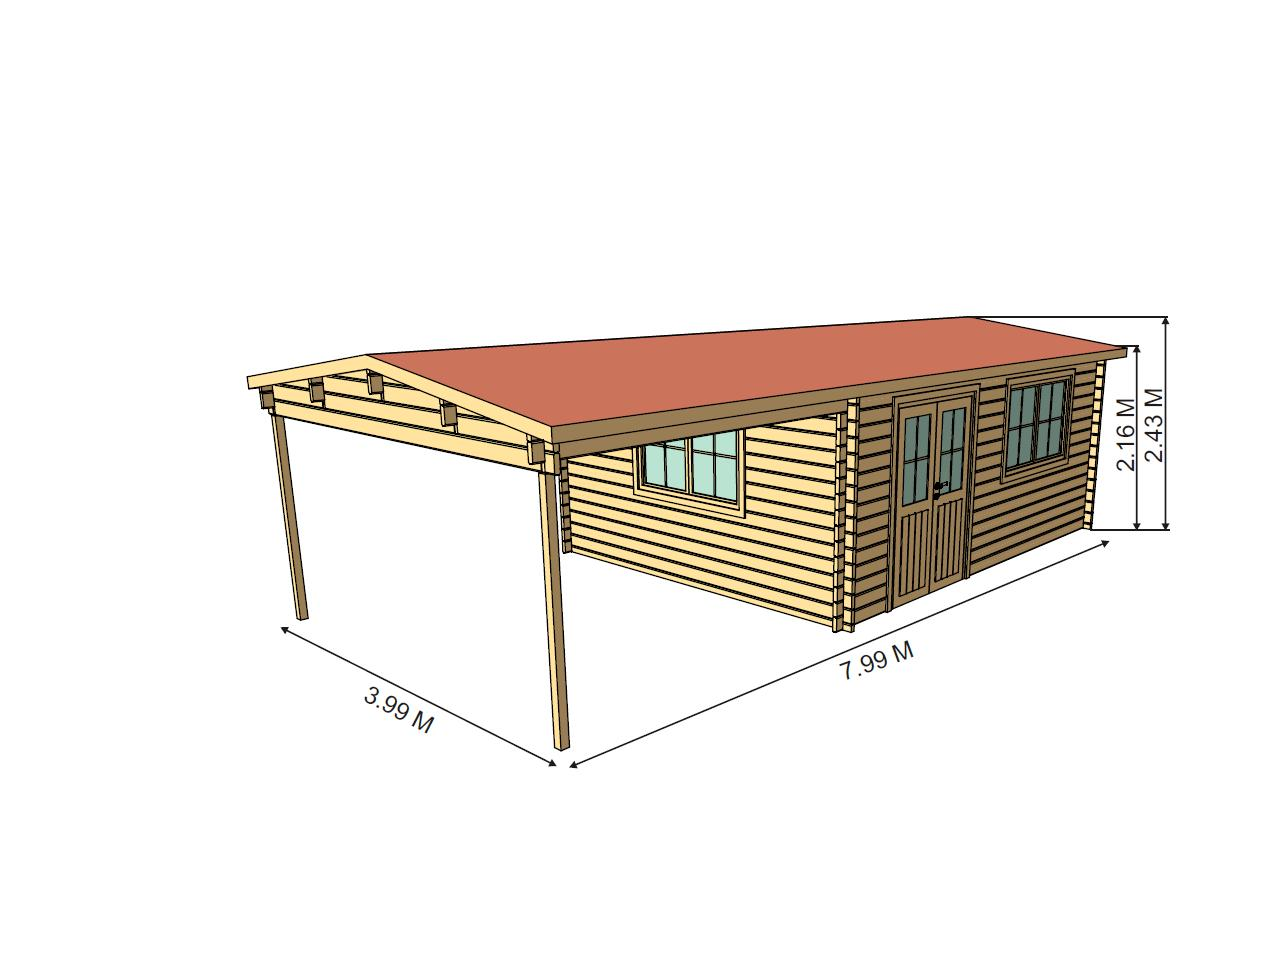 ALICANTE 8 x 4 m 367400  Log Cabins Sheds  Garages